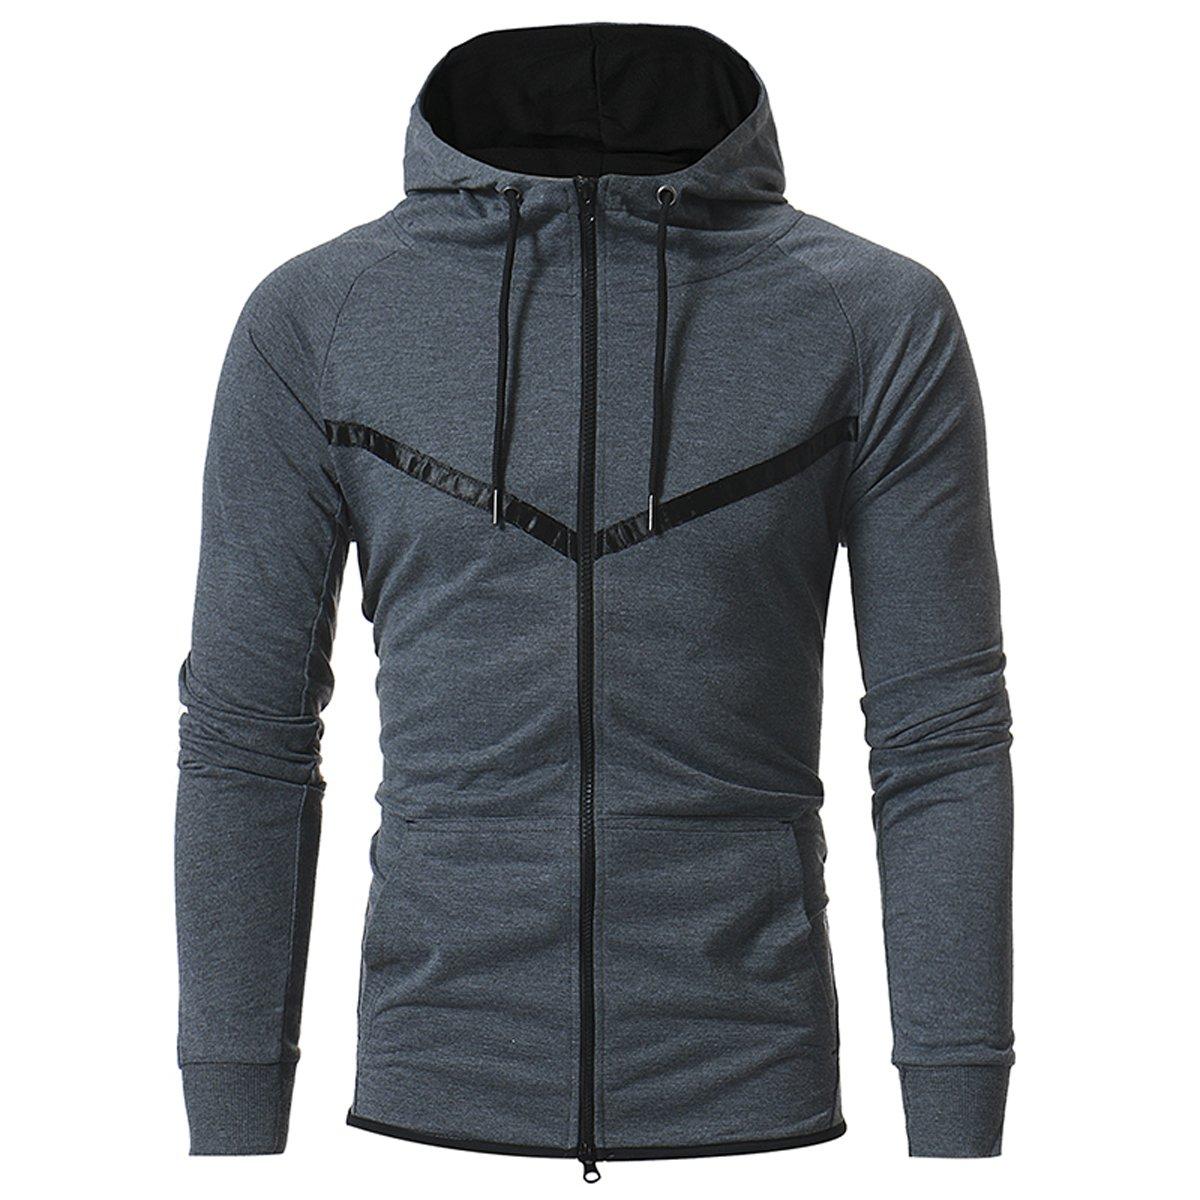 Muzboo Men's Jersey Zipper Hoodie Fitted Long Sleeves Sweatshirt Bodybuilding Workout Gym Running Jogger Hooded Sweatshirt(Gray-XS)